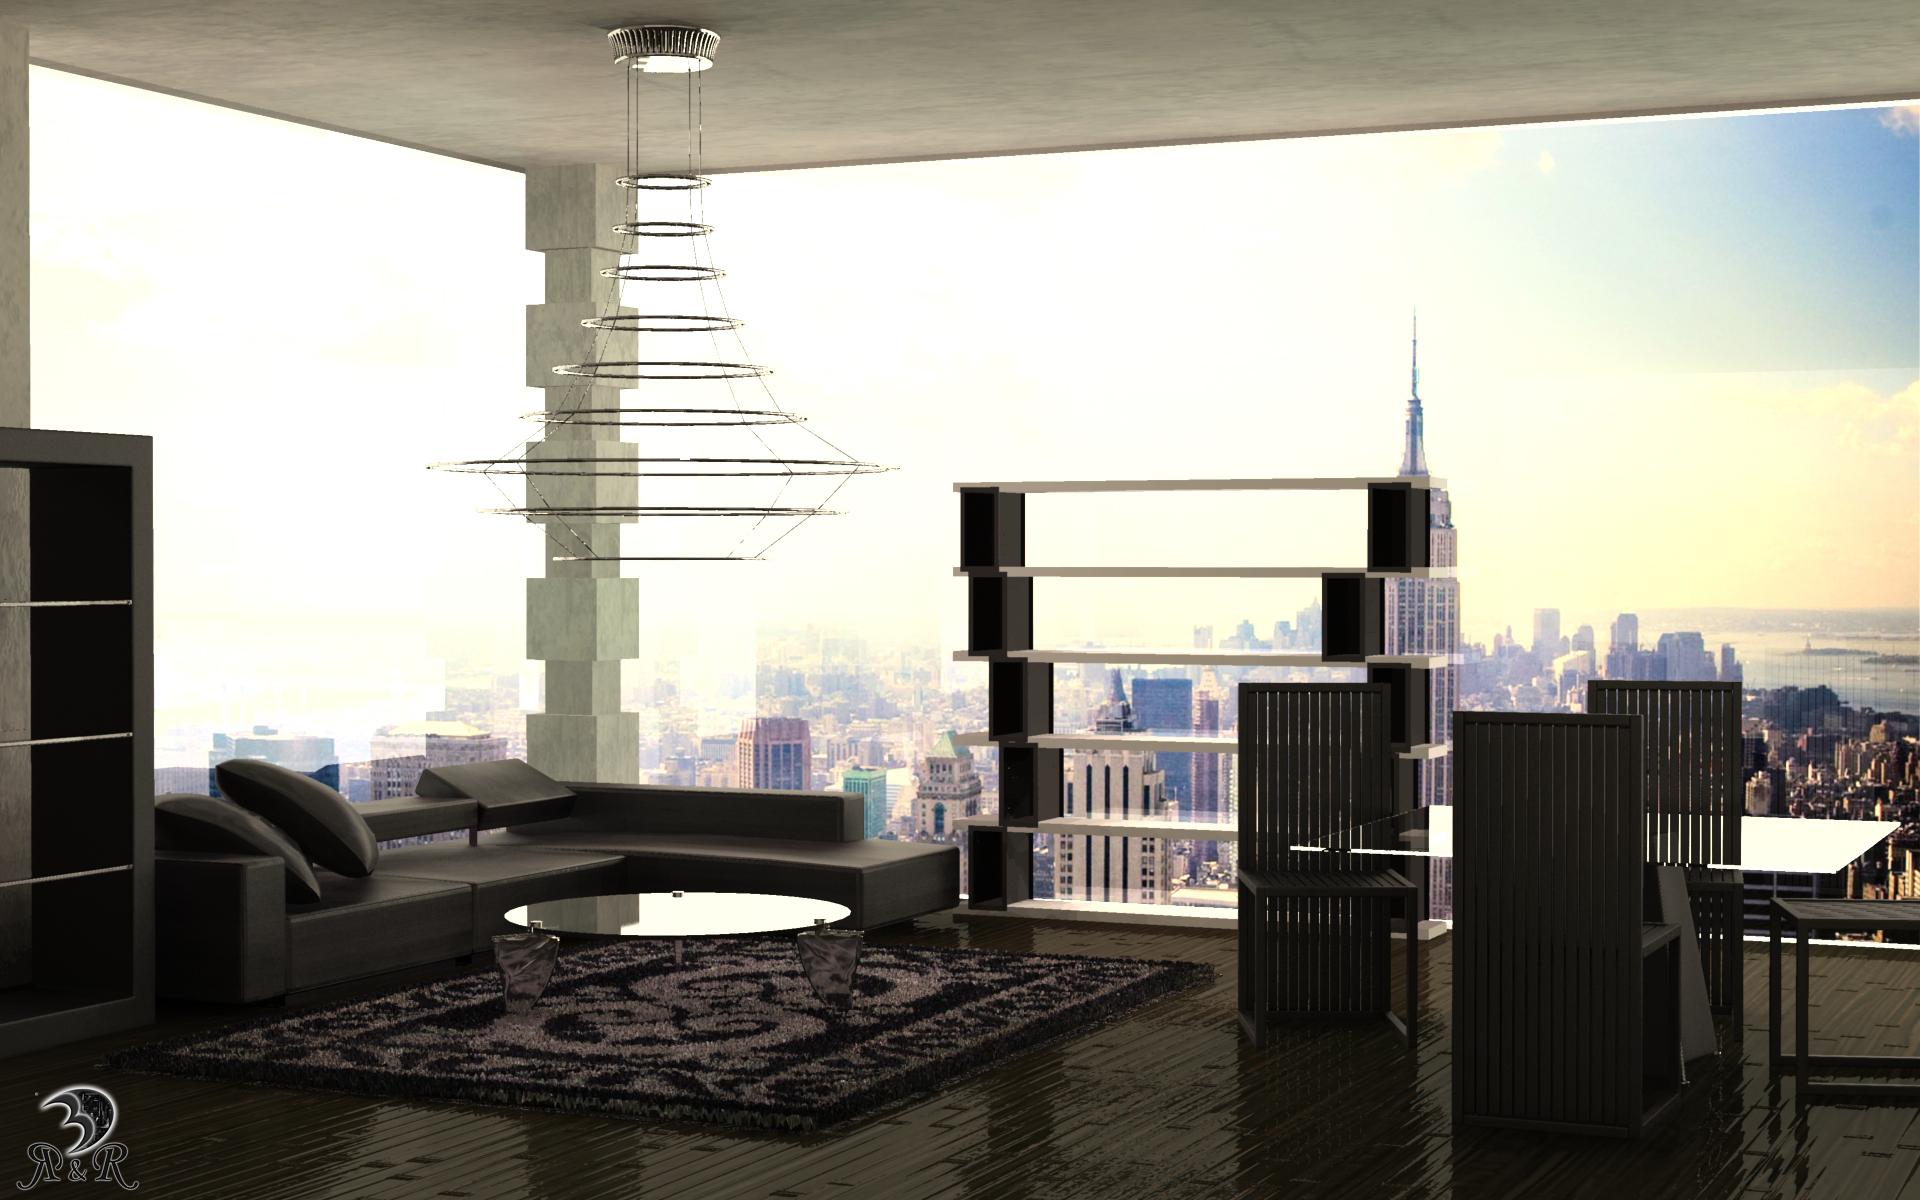 Loft In New York by Deeo Elaclaire on DeviantArt : LoftInNewYorkbyDeeoElaclaire from deeo-elaclaire.deviantart.com size 1920 x 1200 jpeg 1095kB